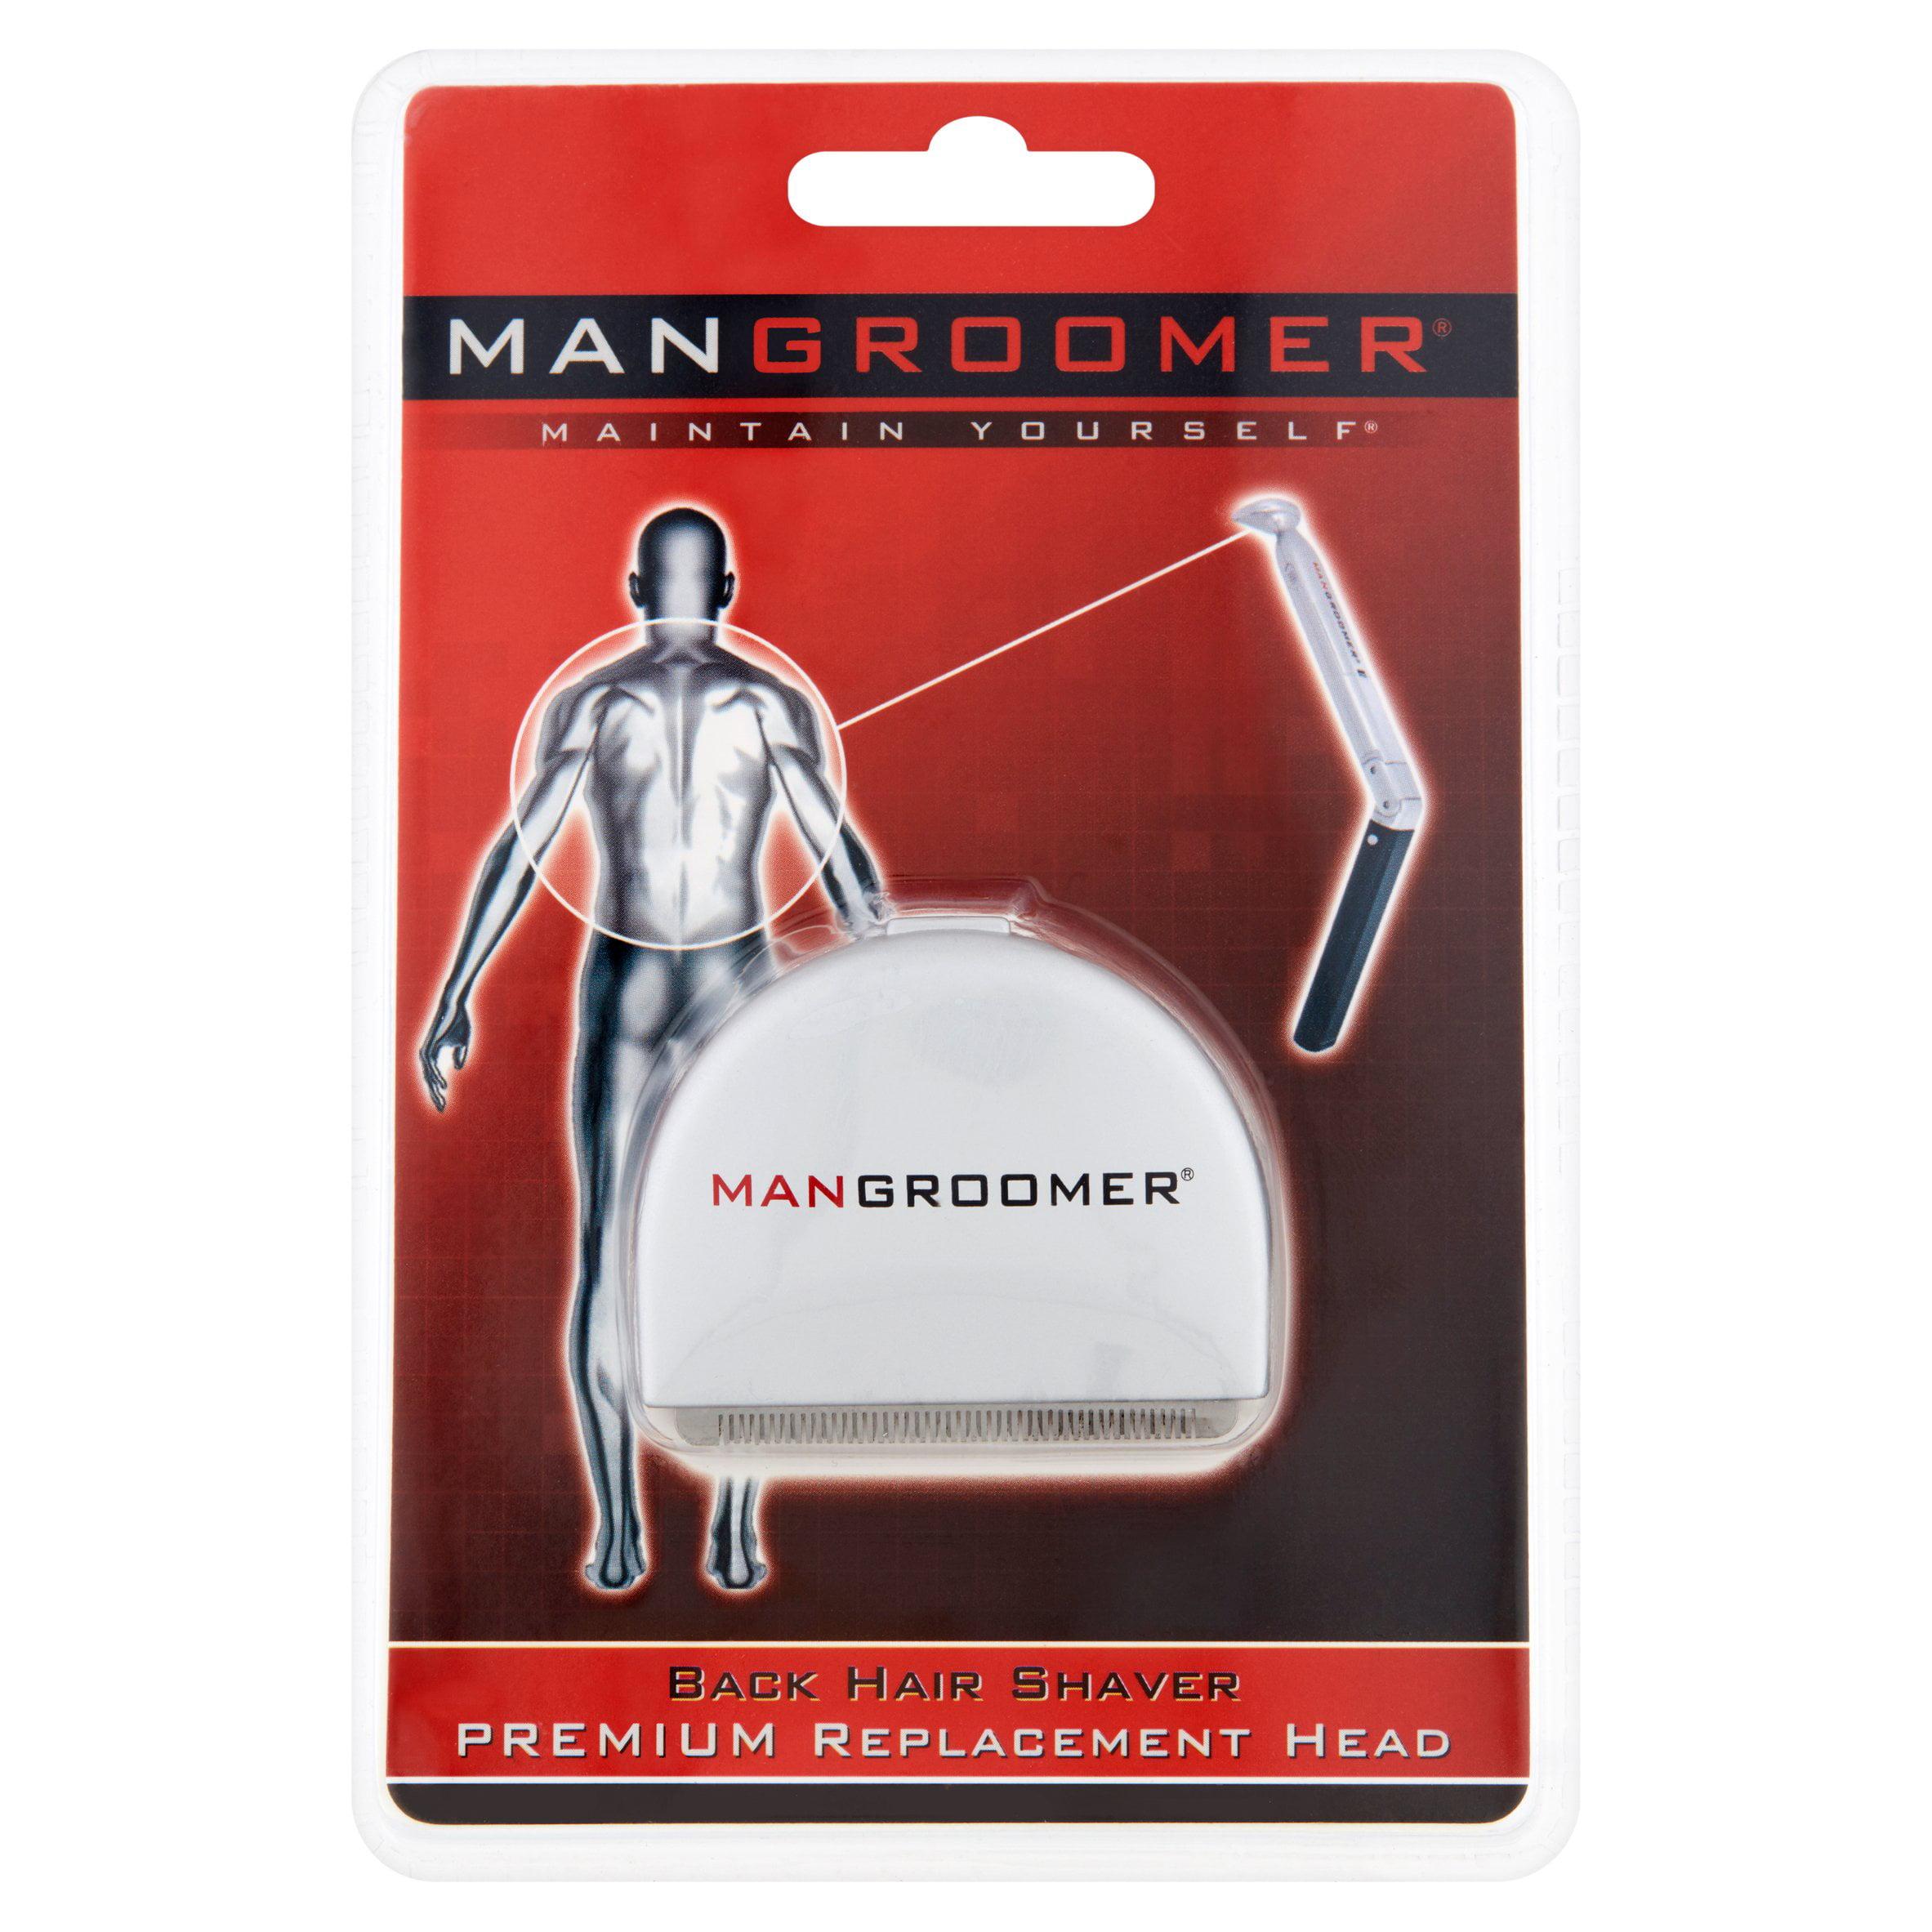 Mangrooomer Maintain Yourself Back Hair Shaver Premium Replacement Head